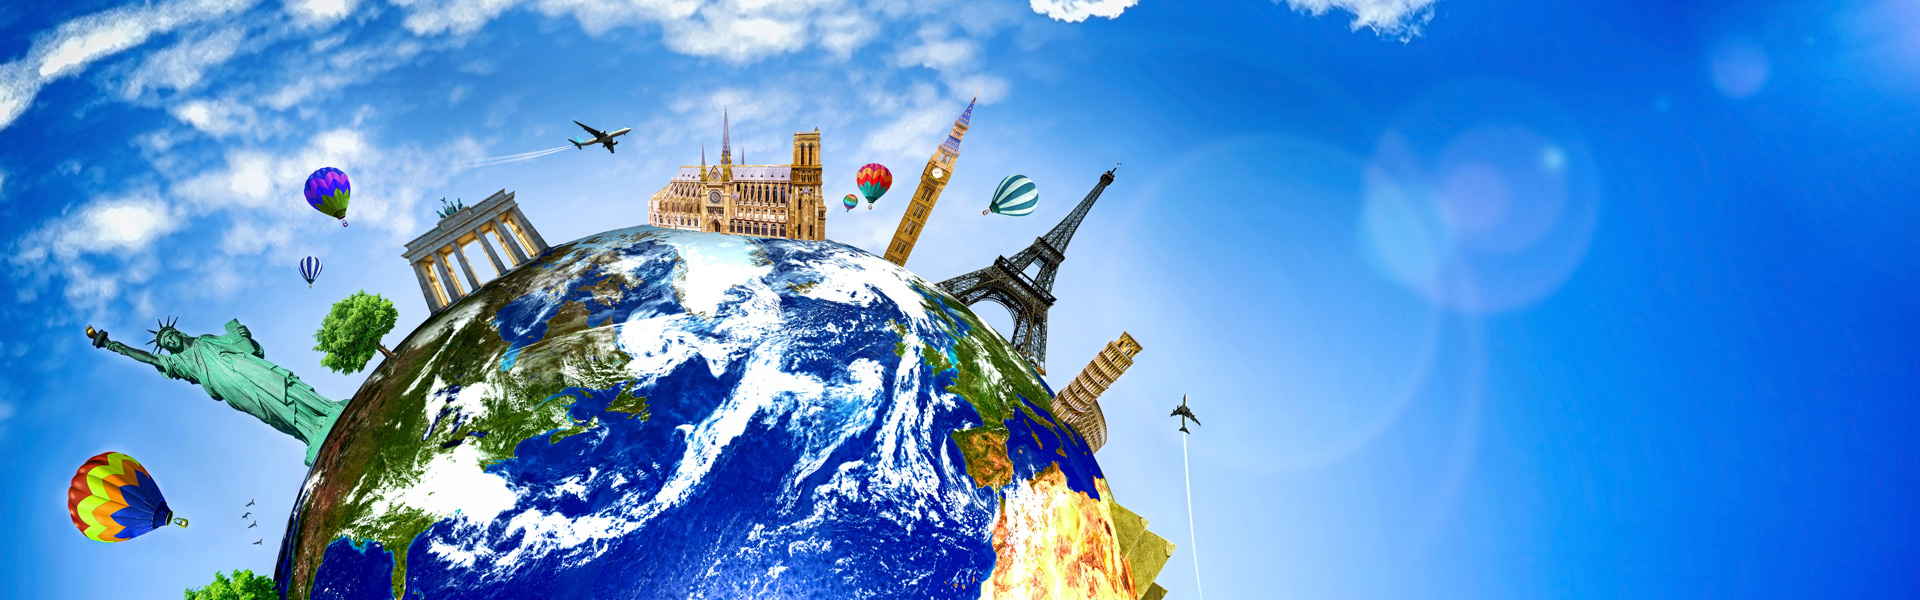 Globe with city landmarks